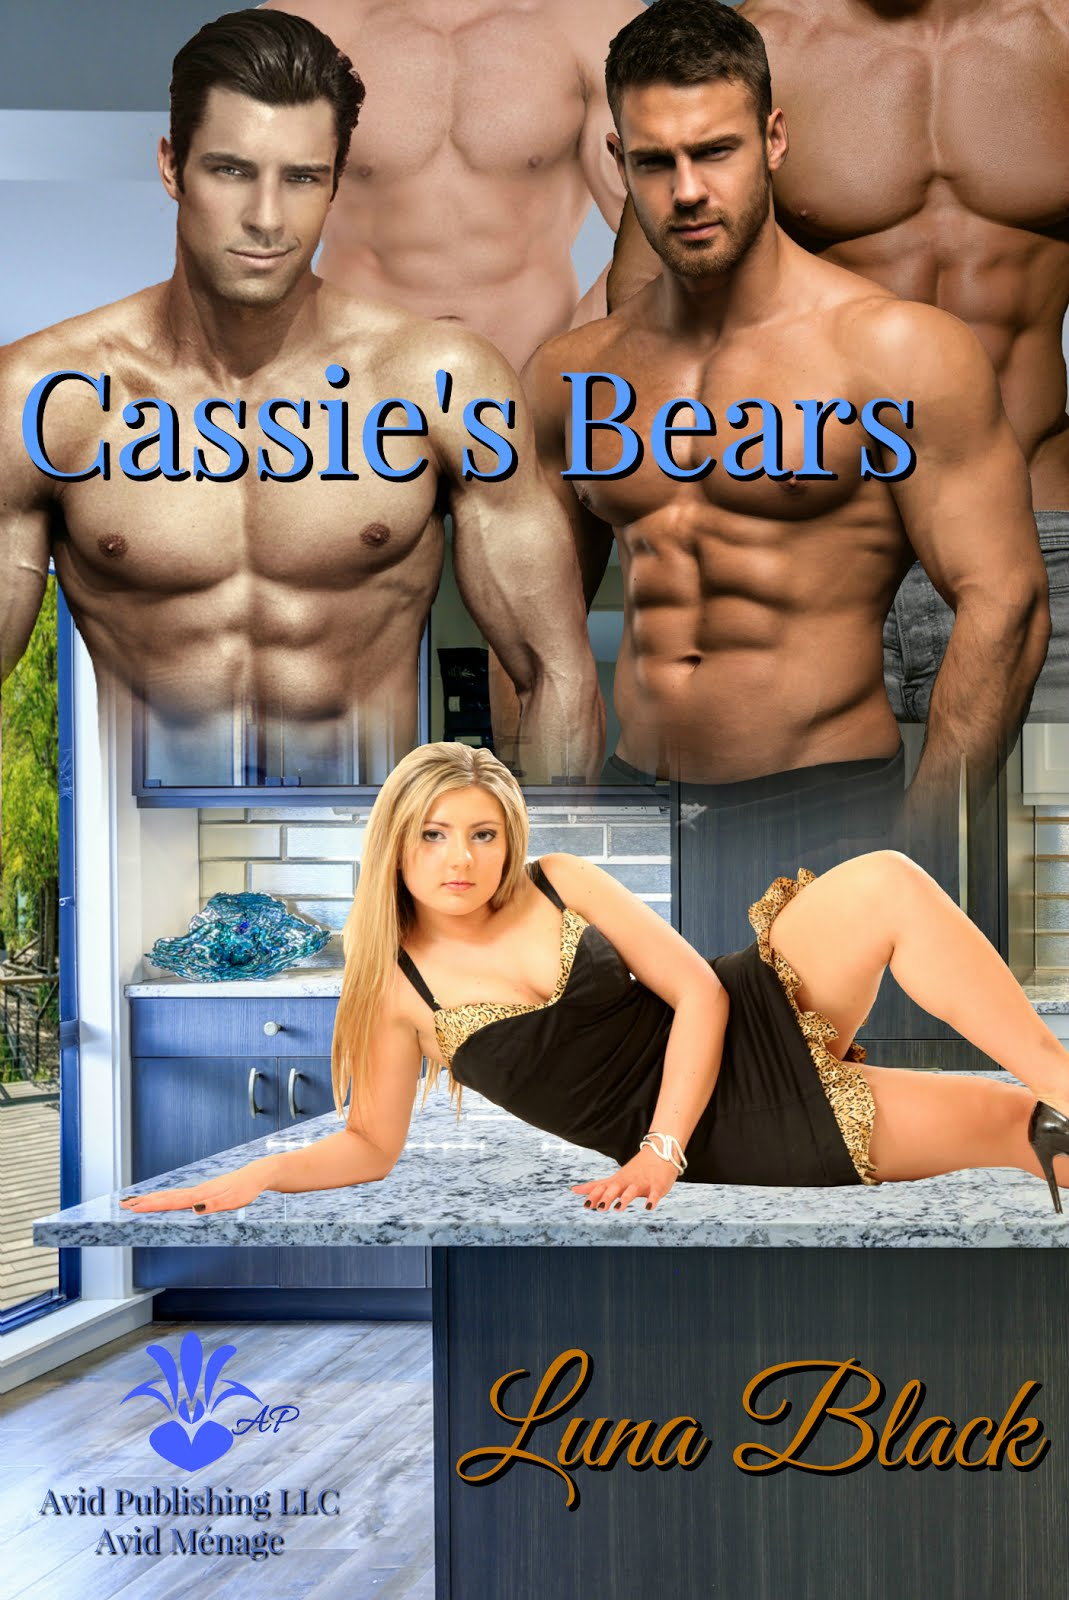 Cassie's Bears